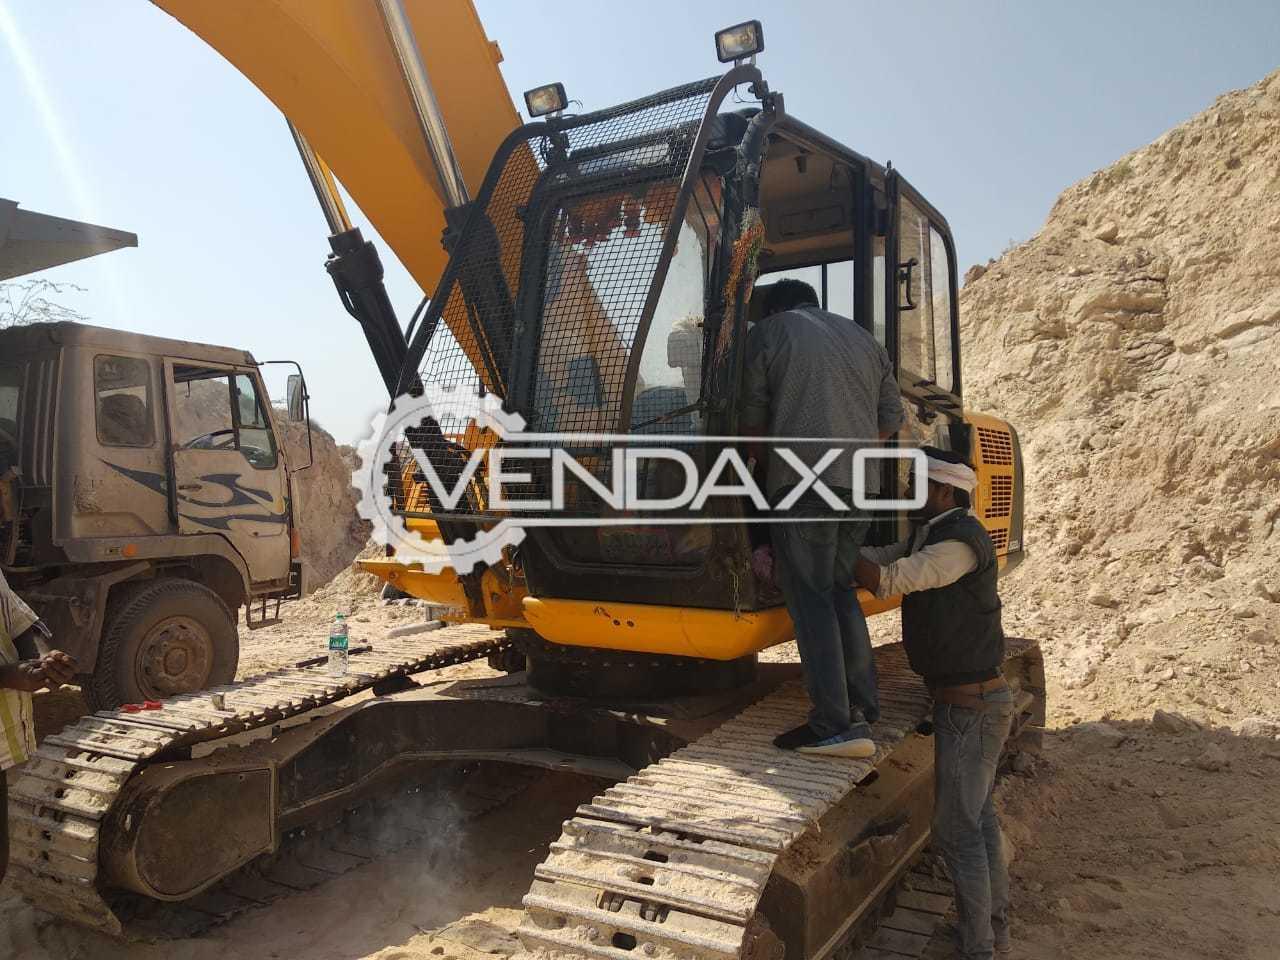 JCB 205 Excavator - 140 HP, 2017 model